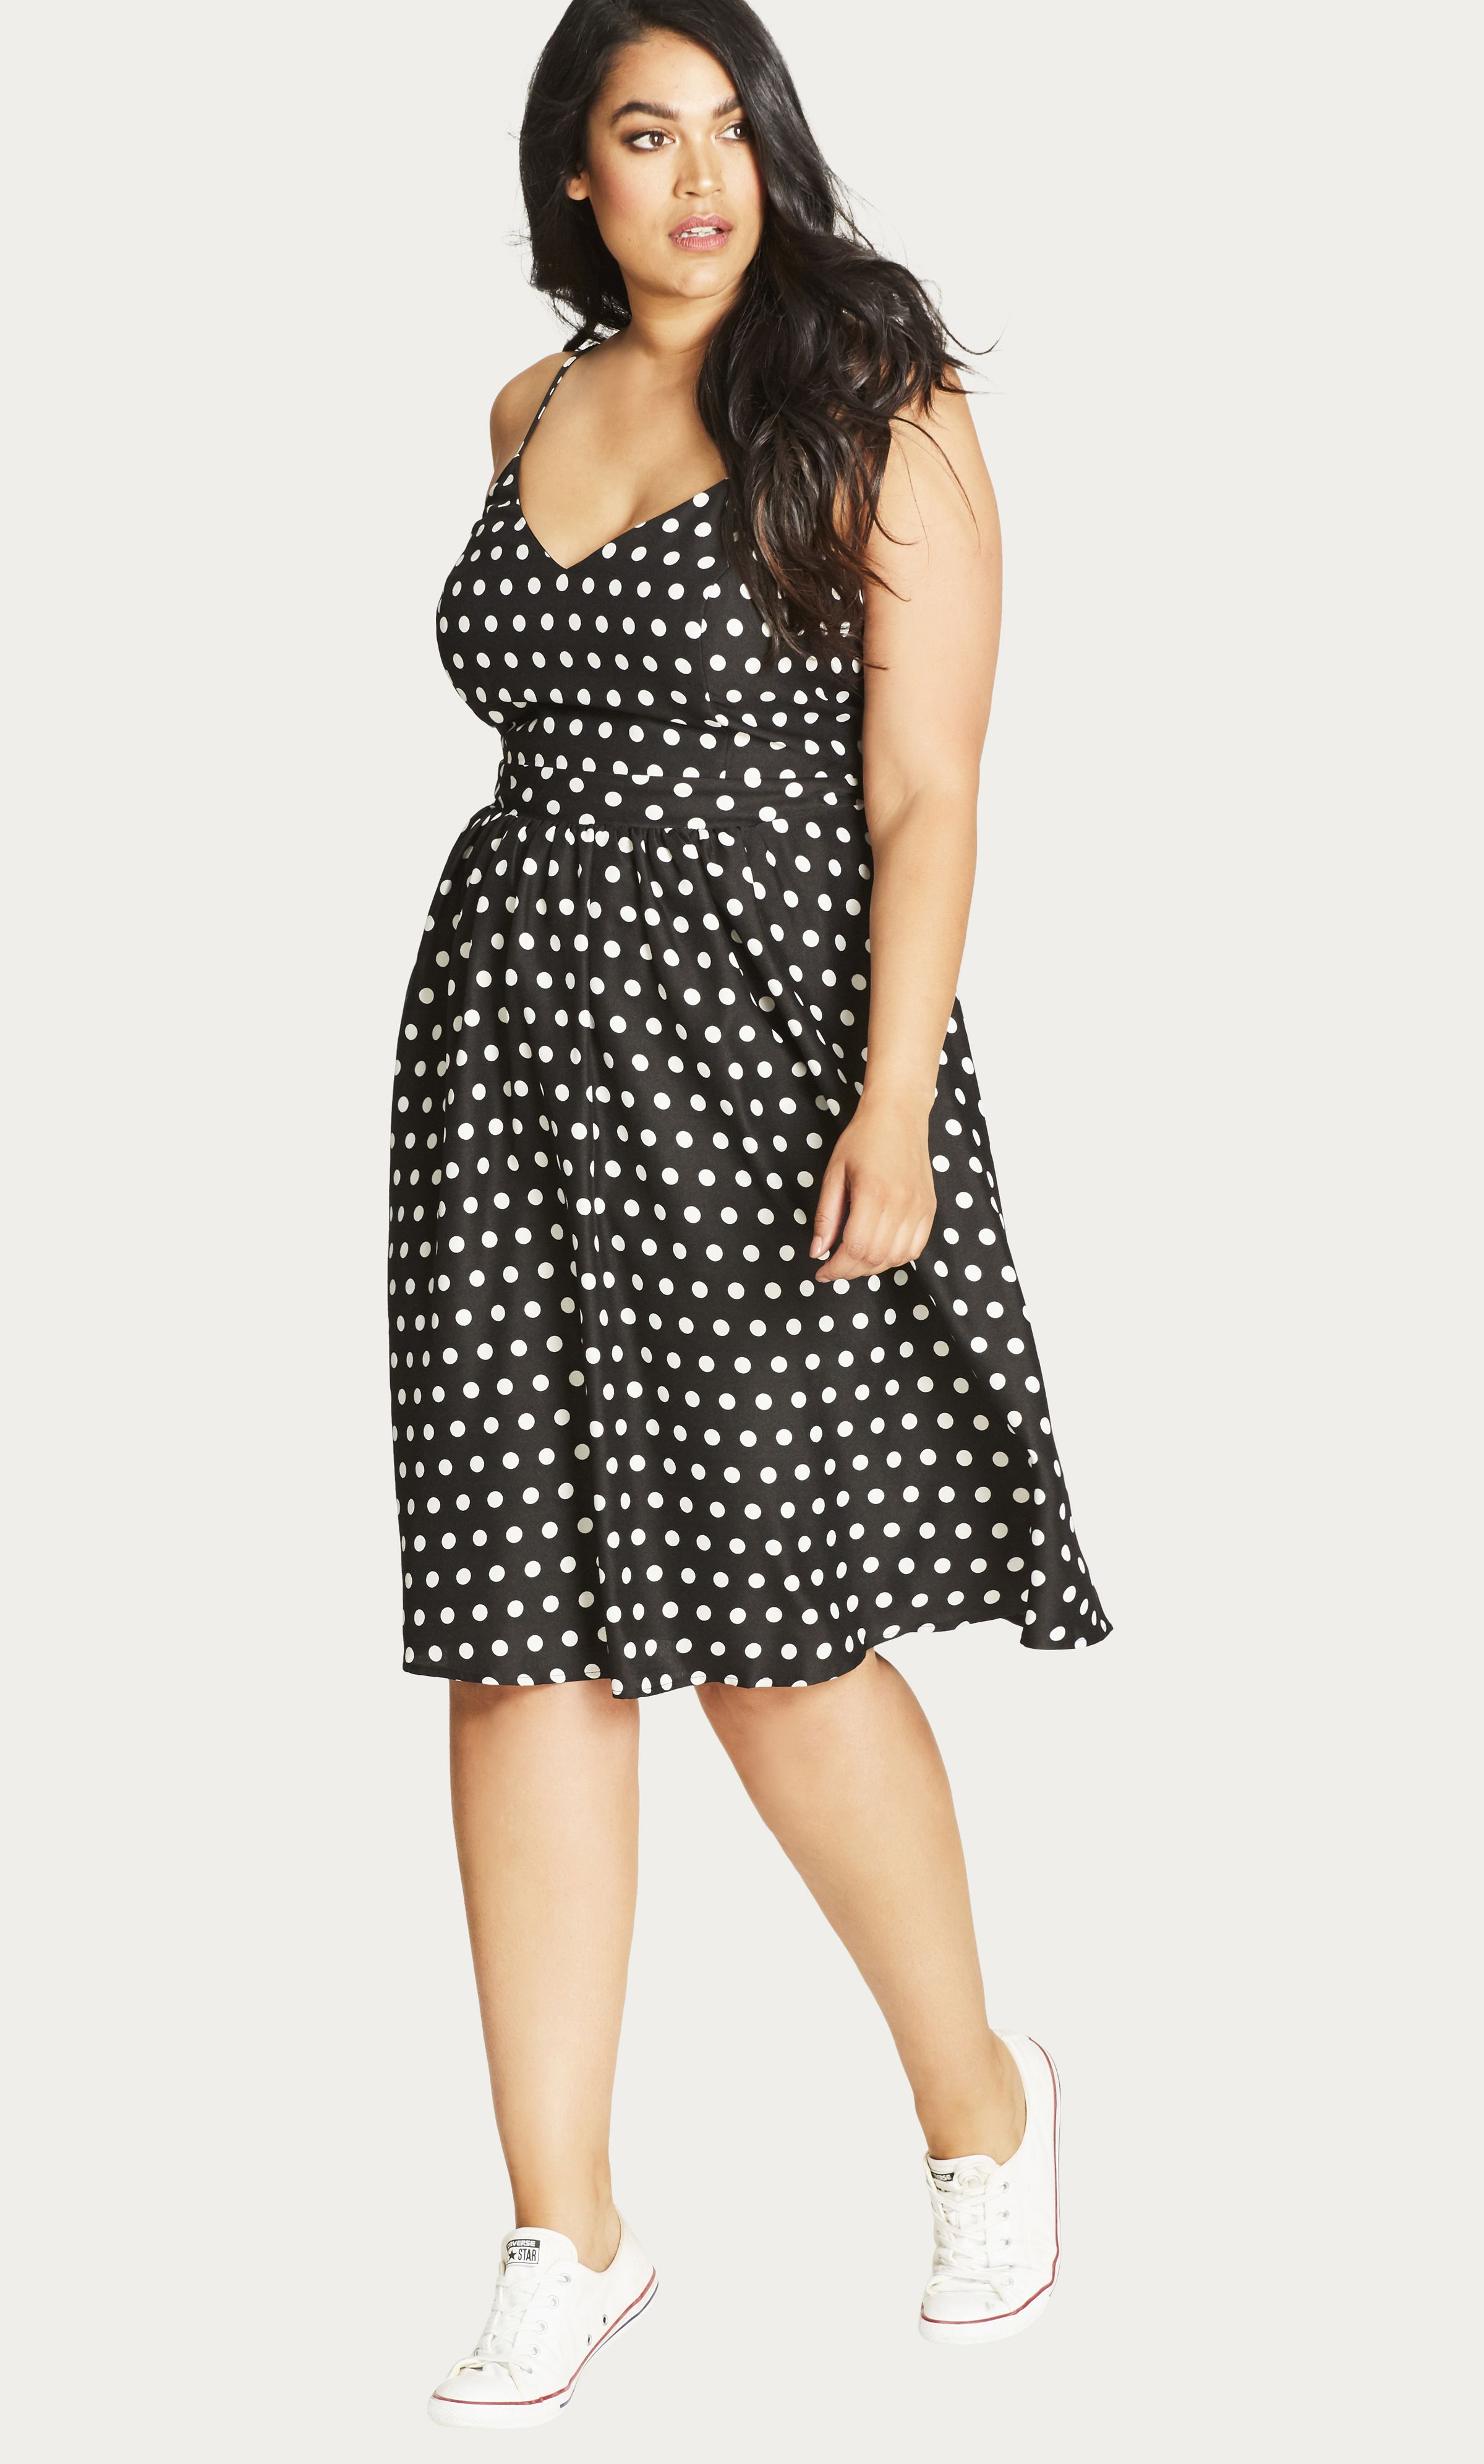 352e6b33cc2d5 Style By Trend  Holiday Boutique City Chic - CUTE GIRL DRESS - Women s Plus  Size Fashion City Chic - City Chic Your Leading Plus Size Fashion  Destination ...